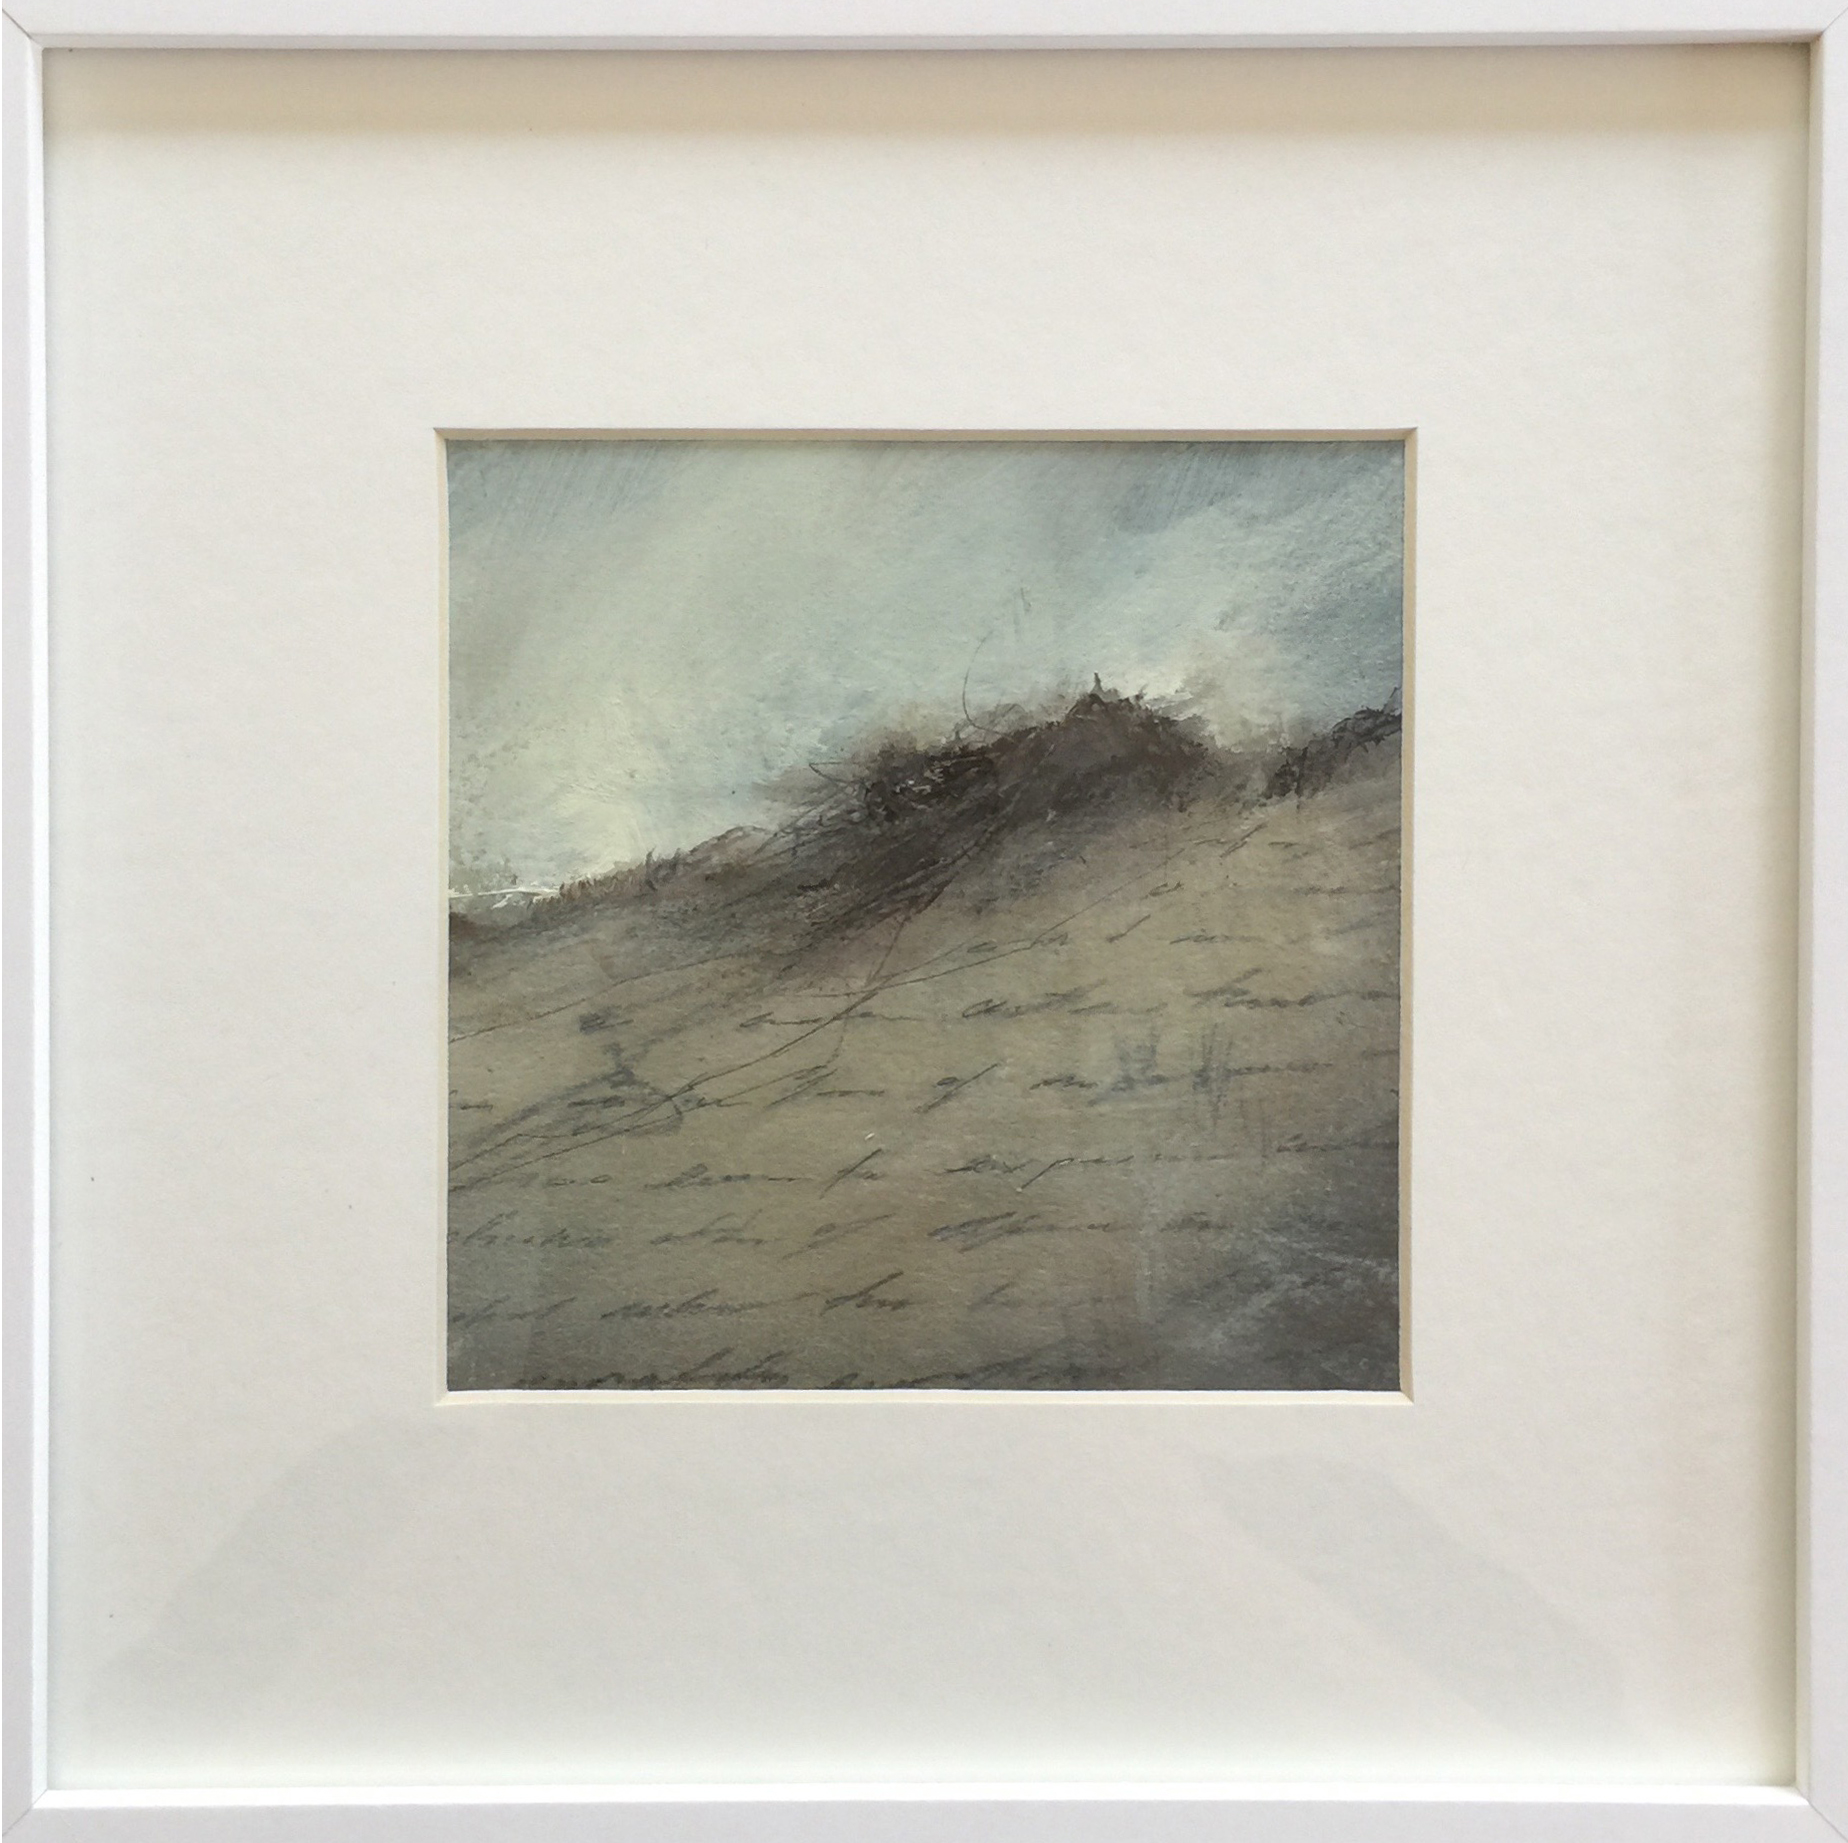 scrubby dune.jpg